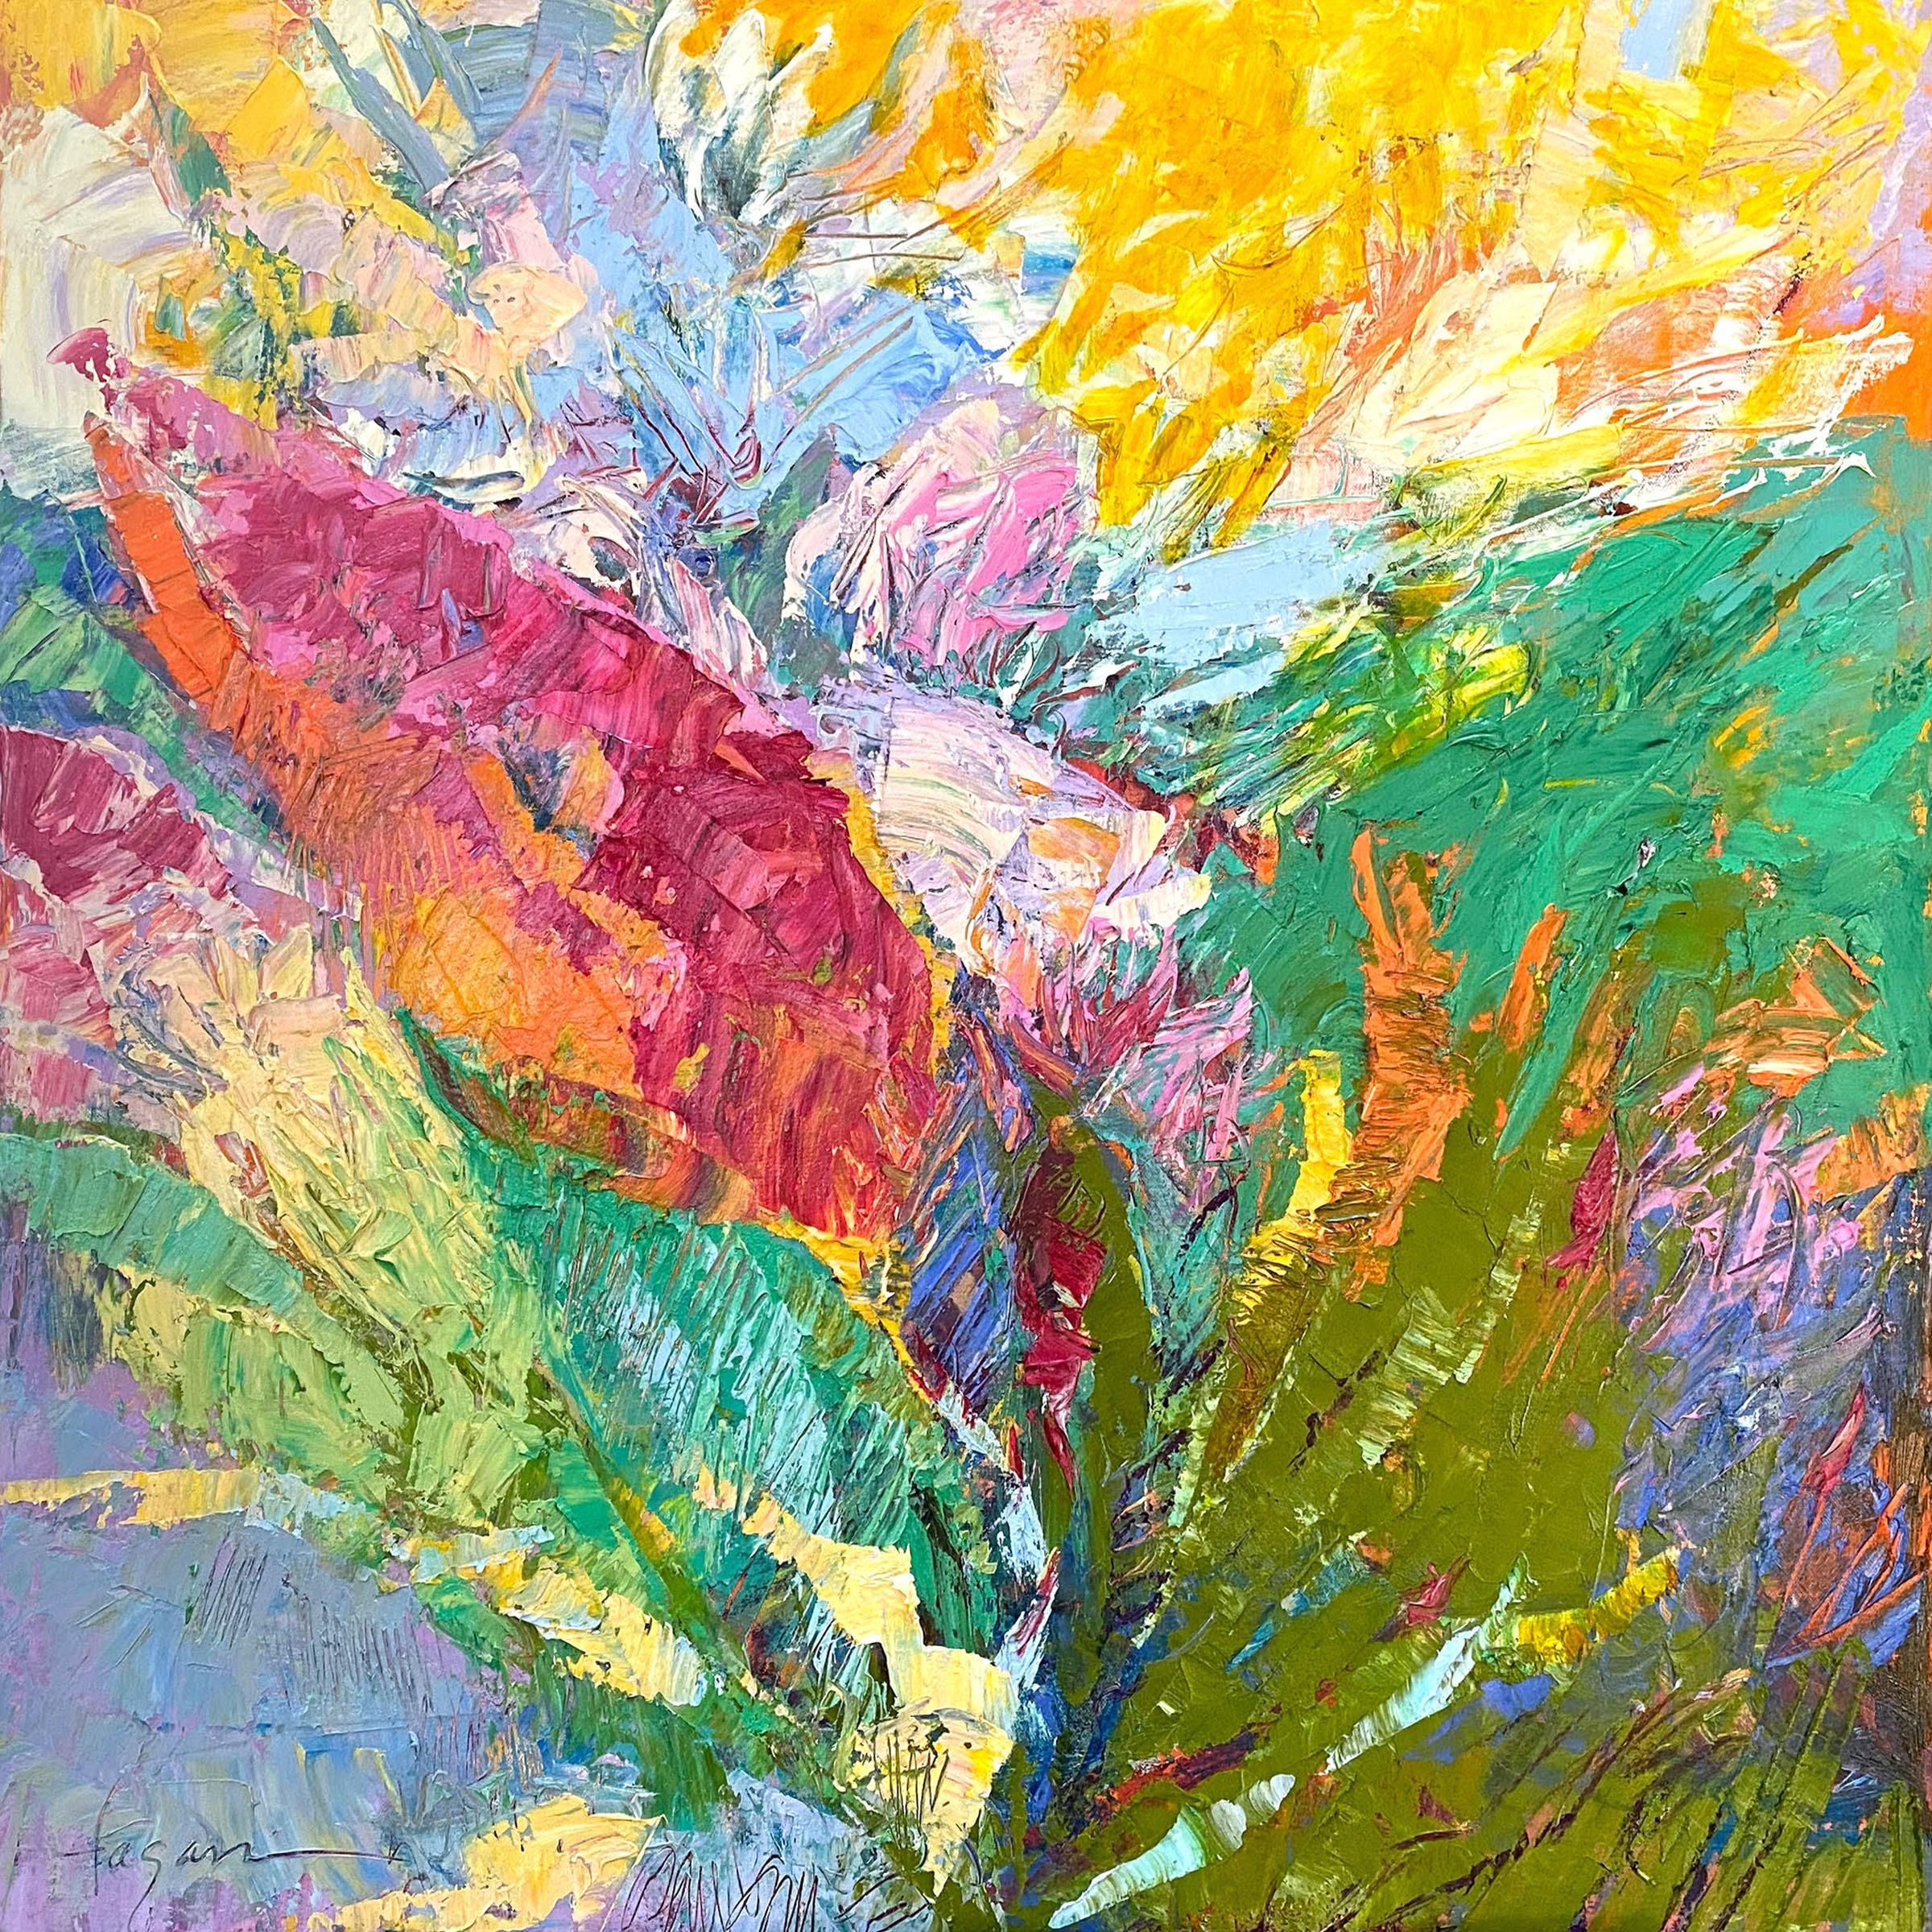 Light as a feather 2400 xqttju